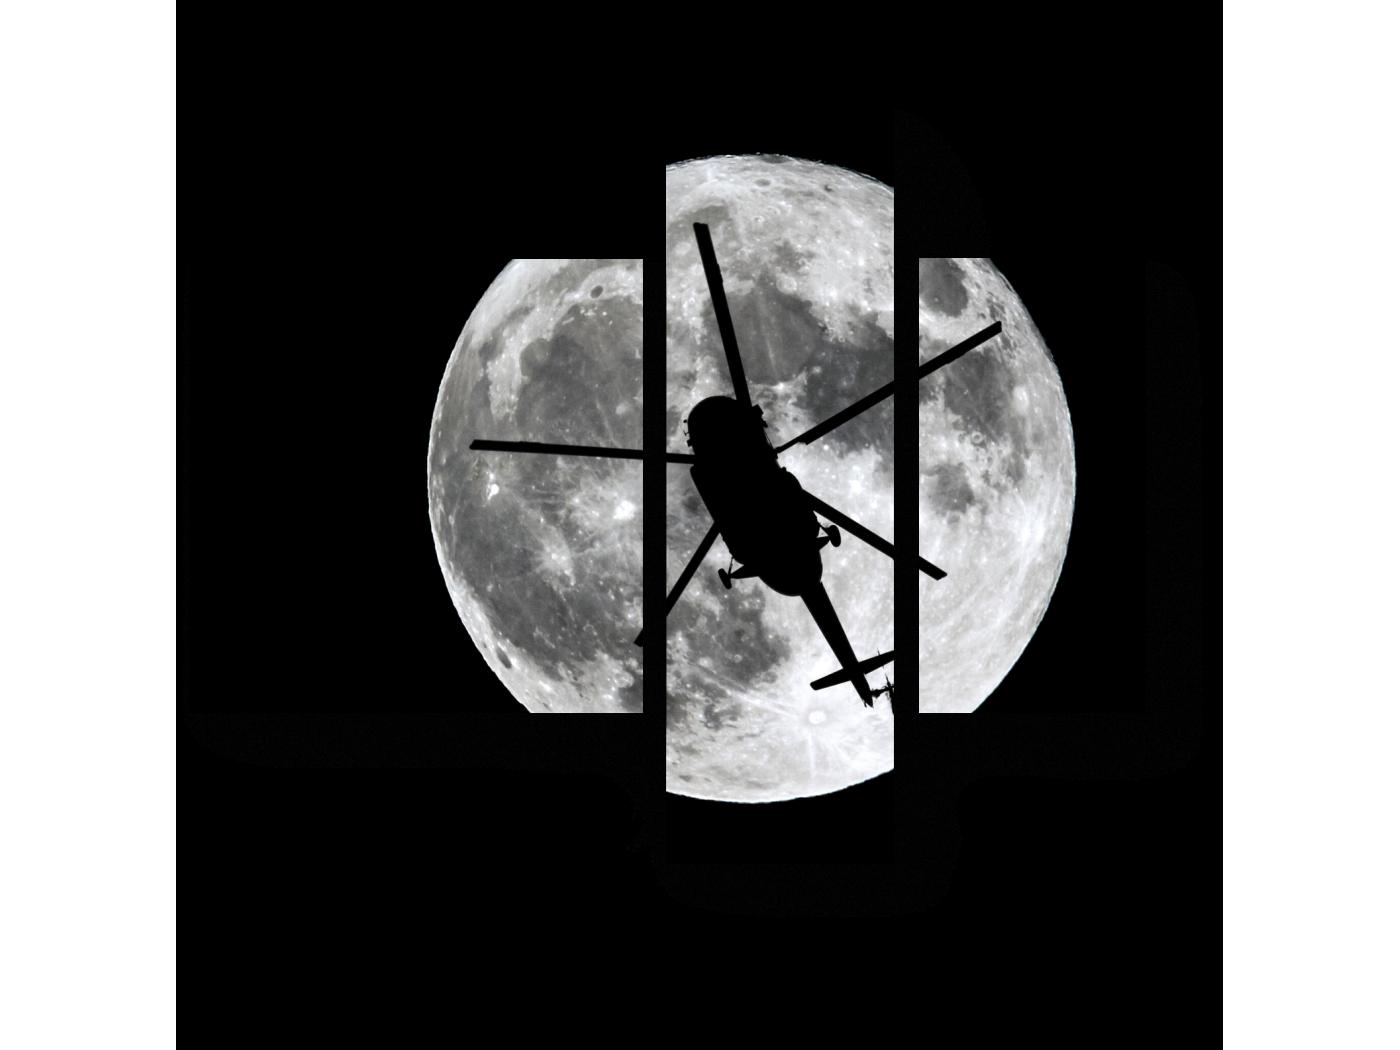 Модульная картина Силуэт вертолета на фоне луны (80x66) фото